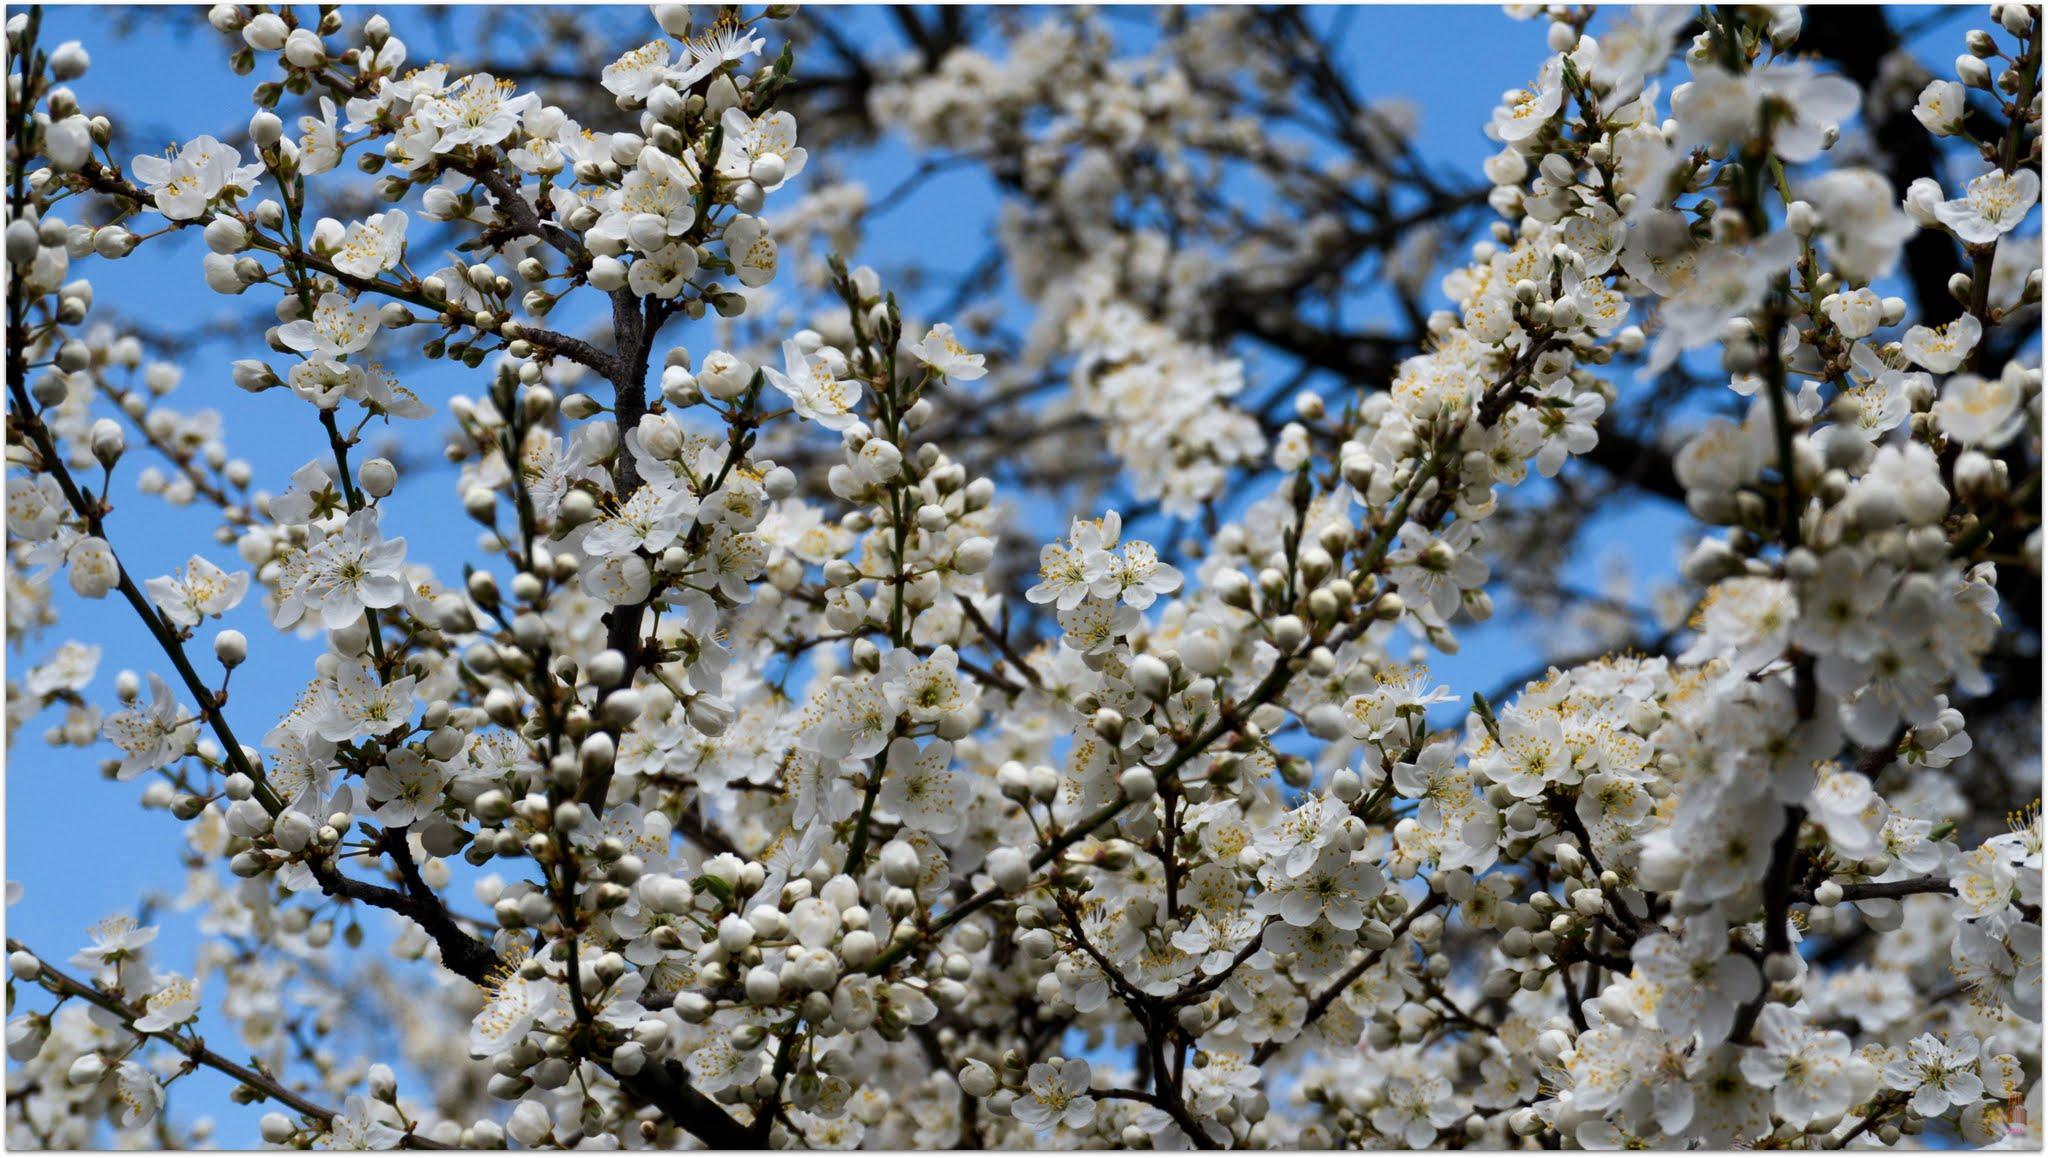 White appletree blossom